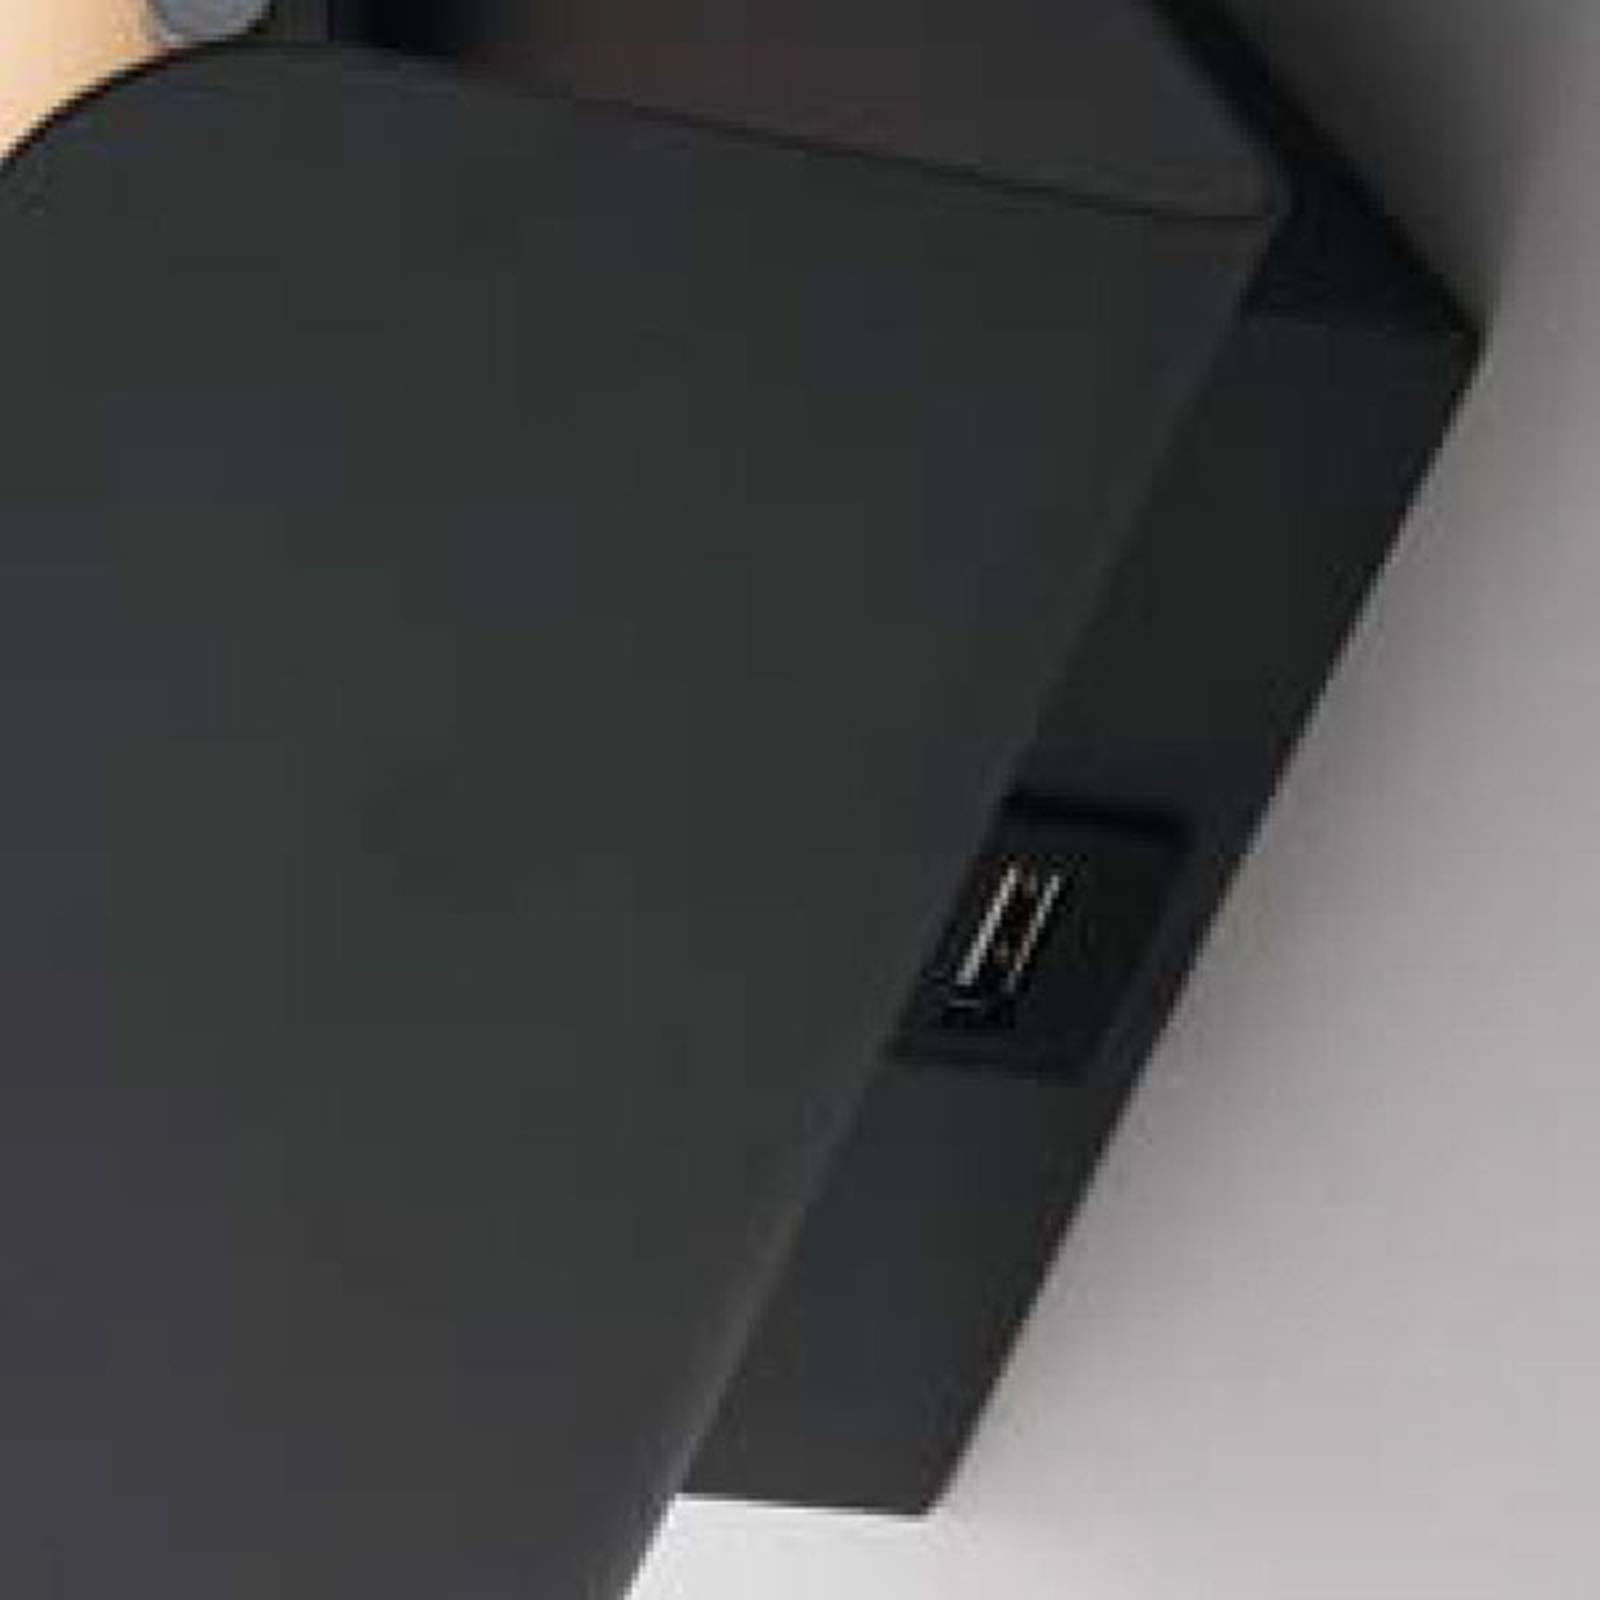 LED-Wandleuchte Boing schwarz